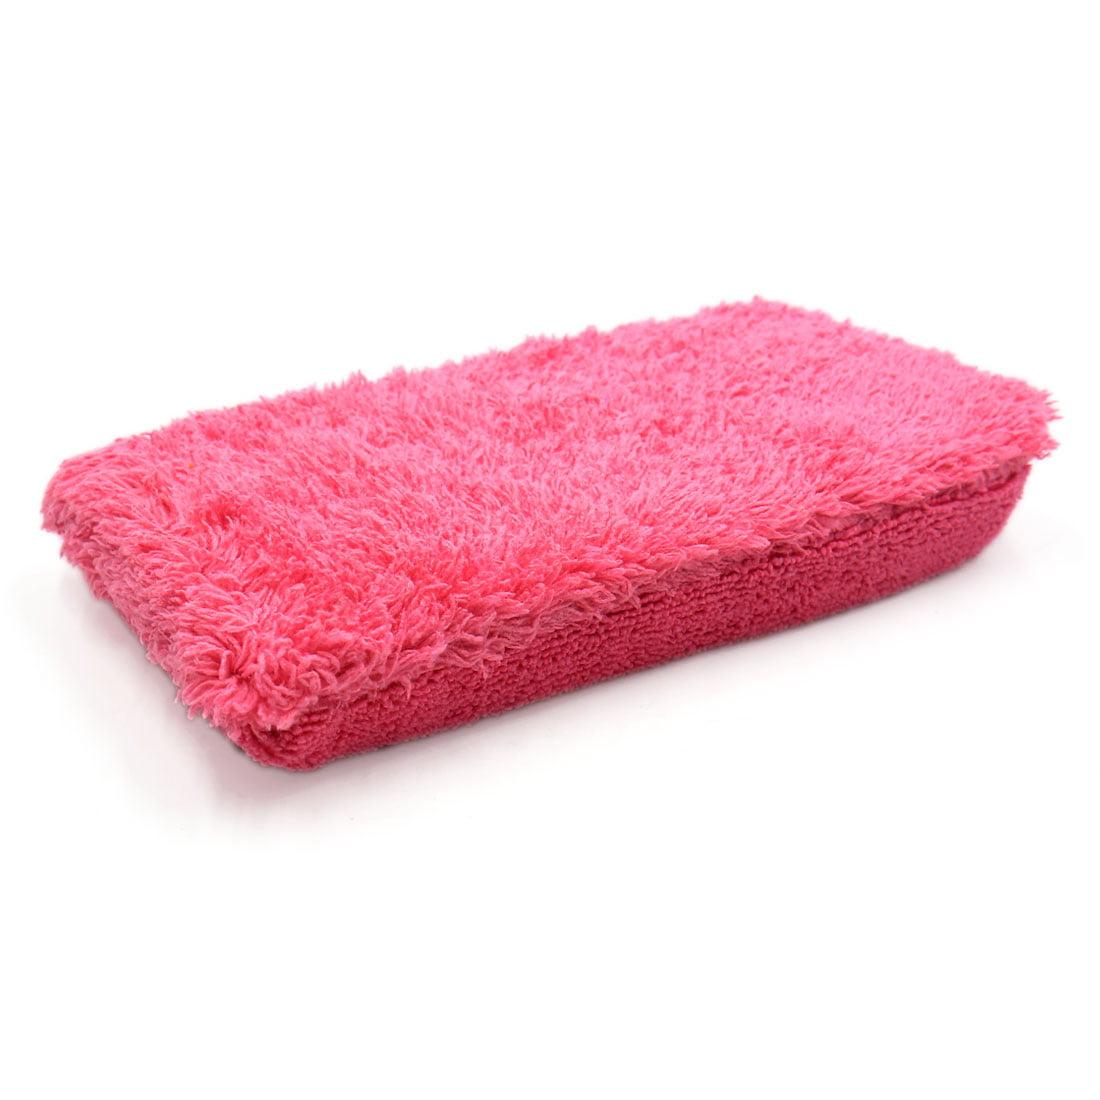 Microfiber Chenille Car Auto Wash Brush Sponge Pad Cleaning Polishing Tool Pink